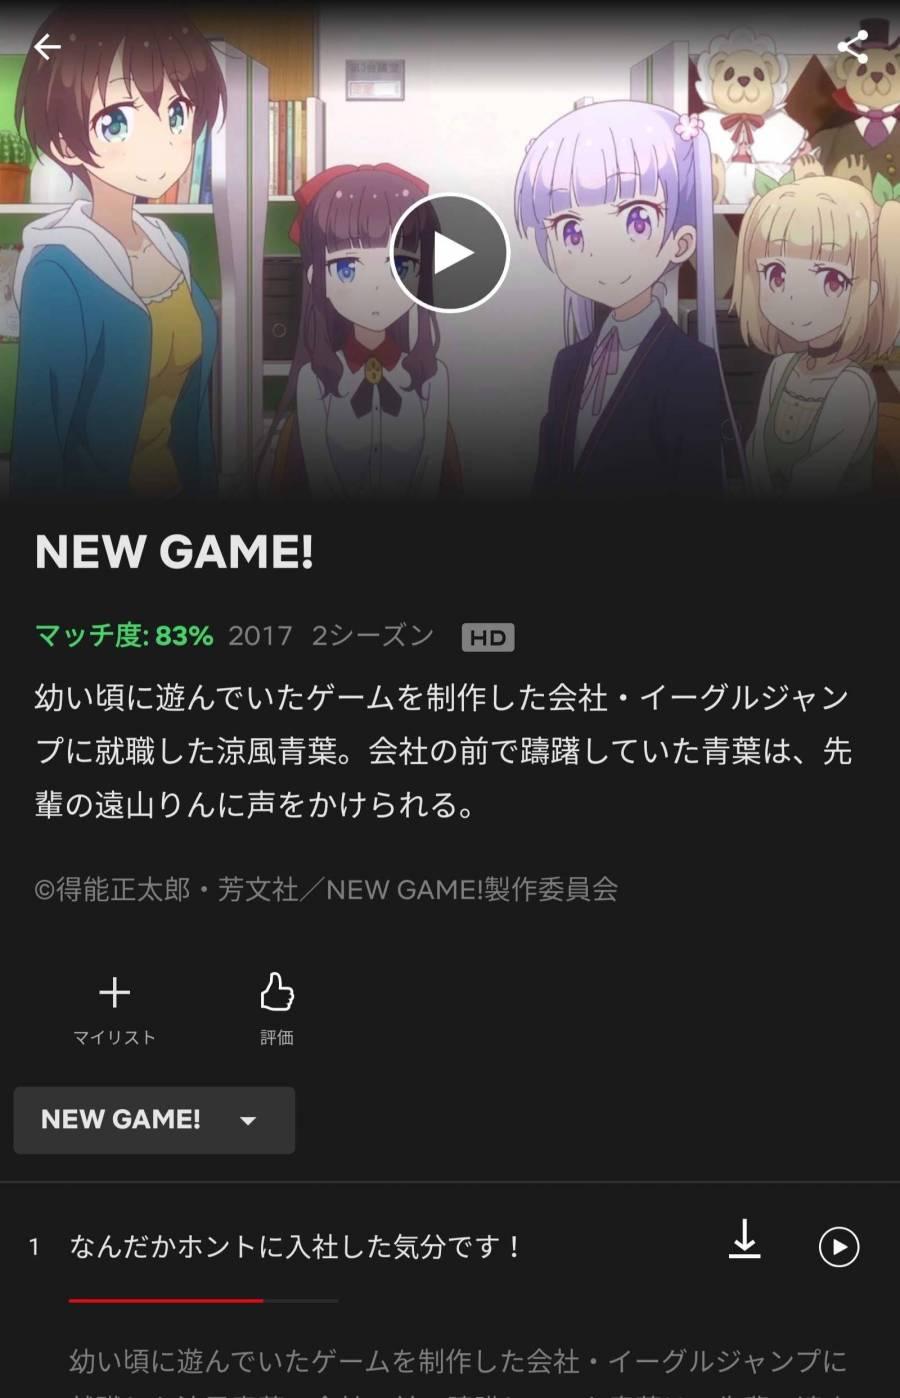 NEW GAME!作品ページ